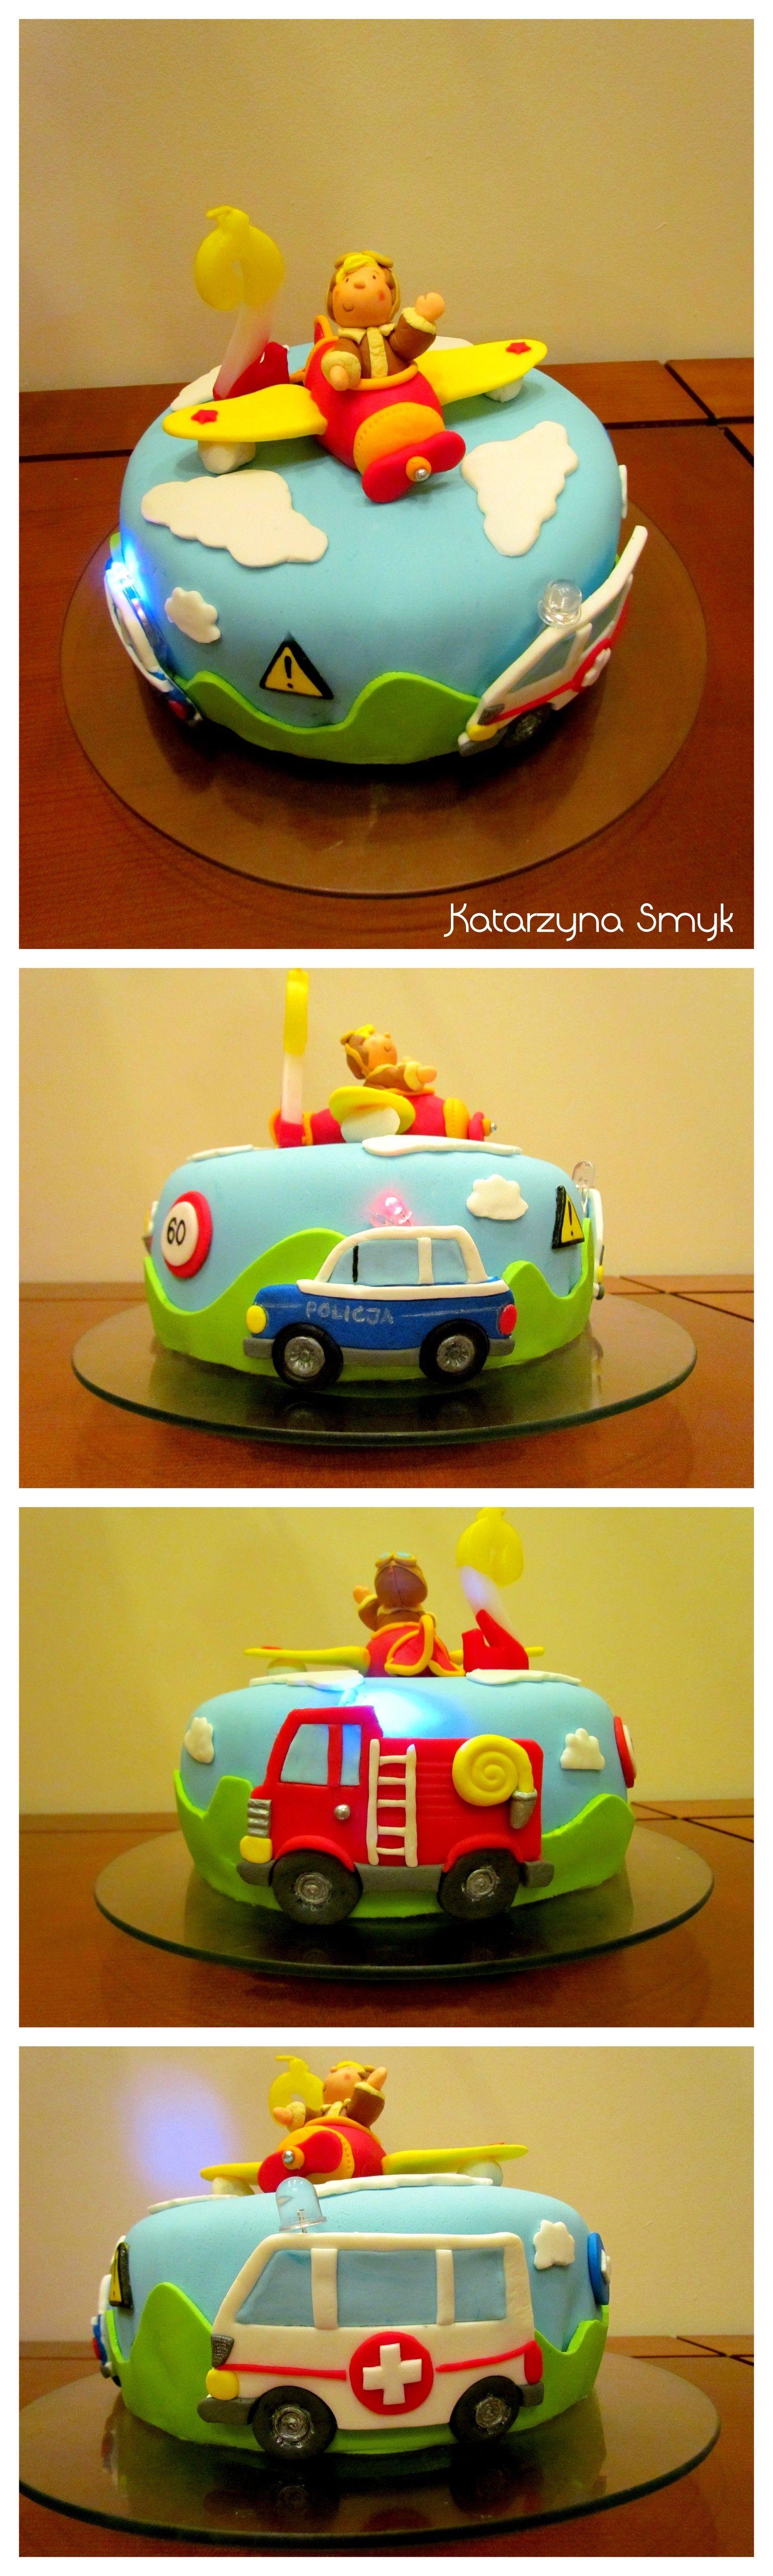 Transportation cake Fondant police car fire truck and ambulance